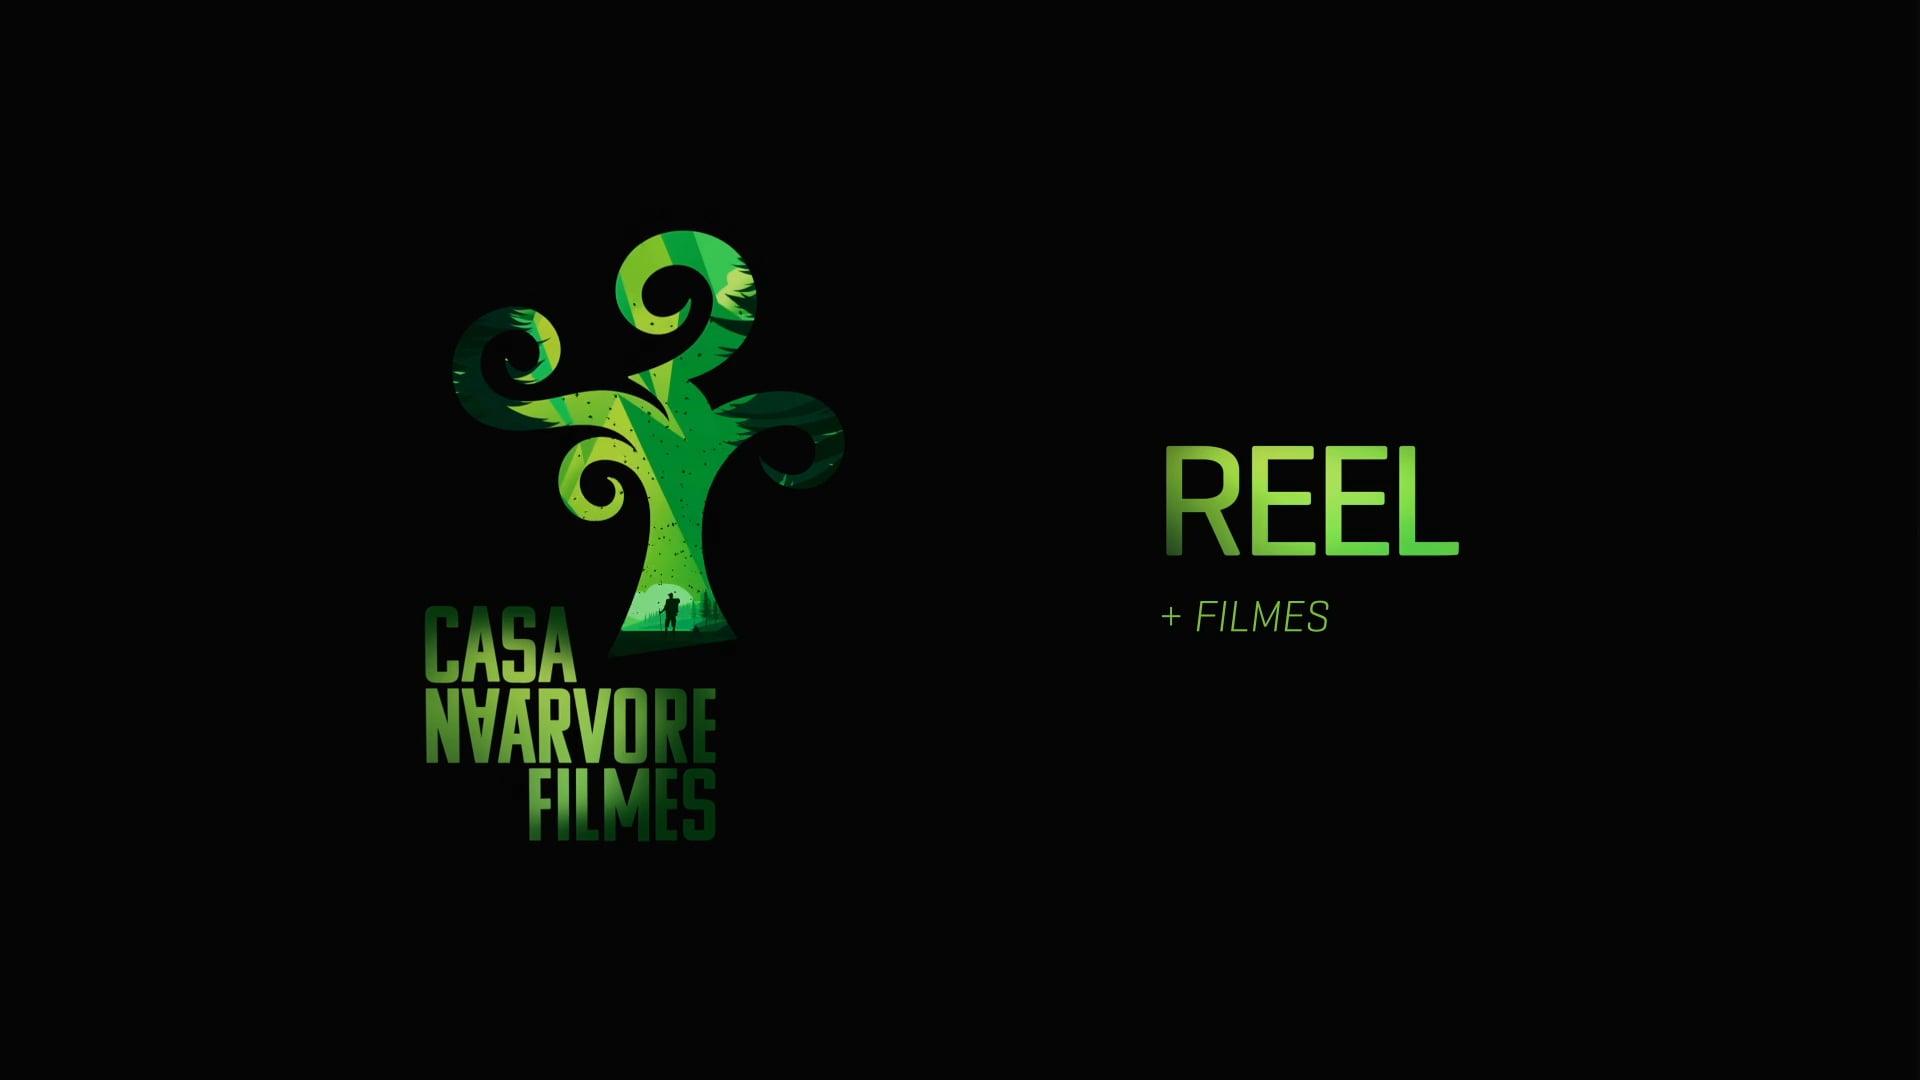 Reel ·FILMES